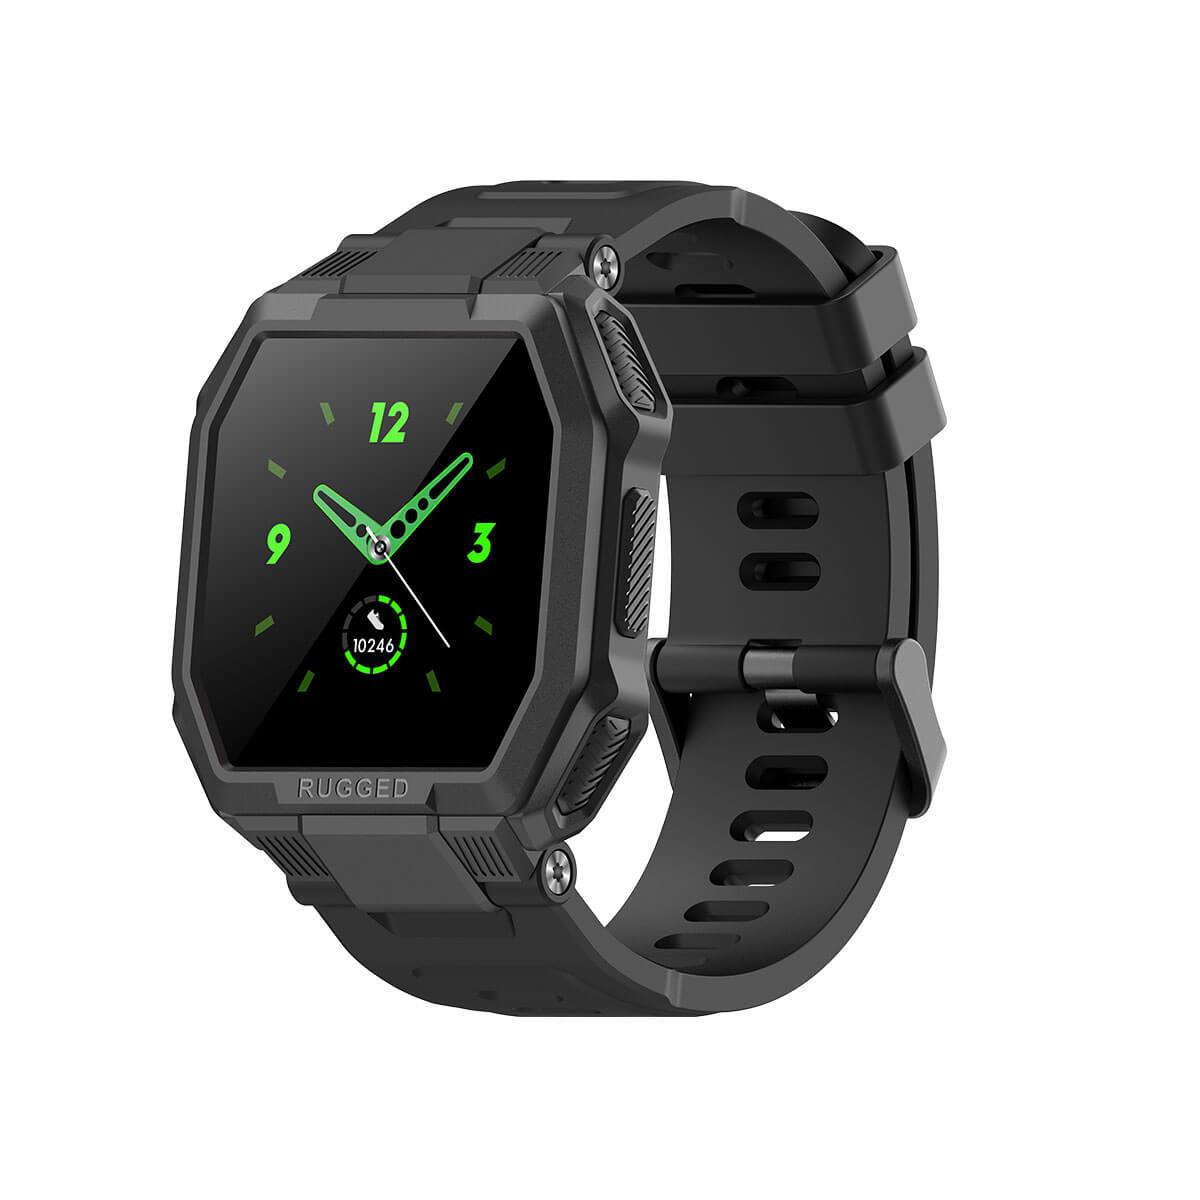 R6 Rugged Smartwatch